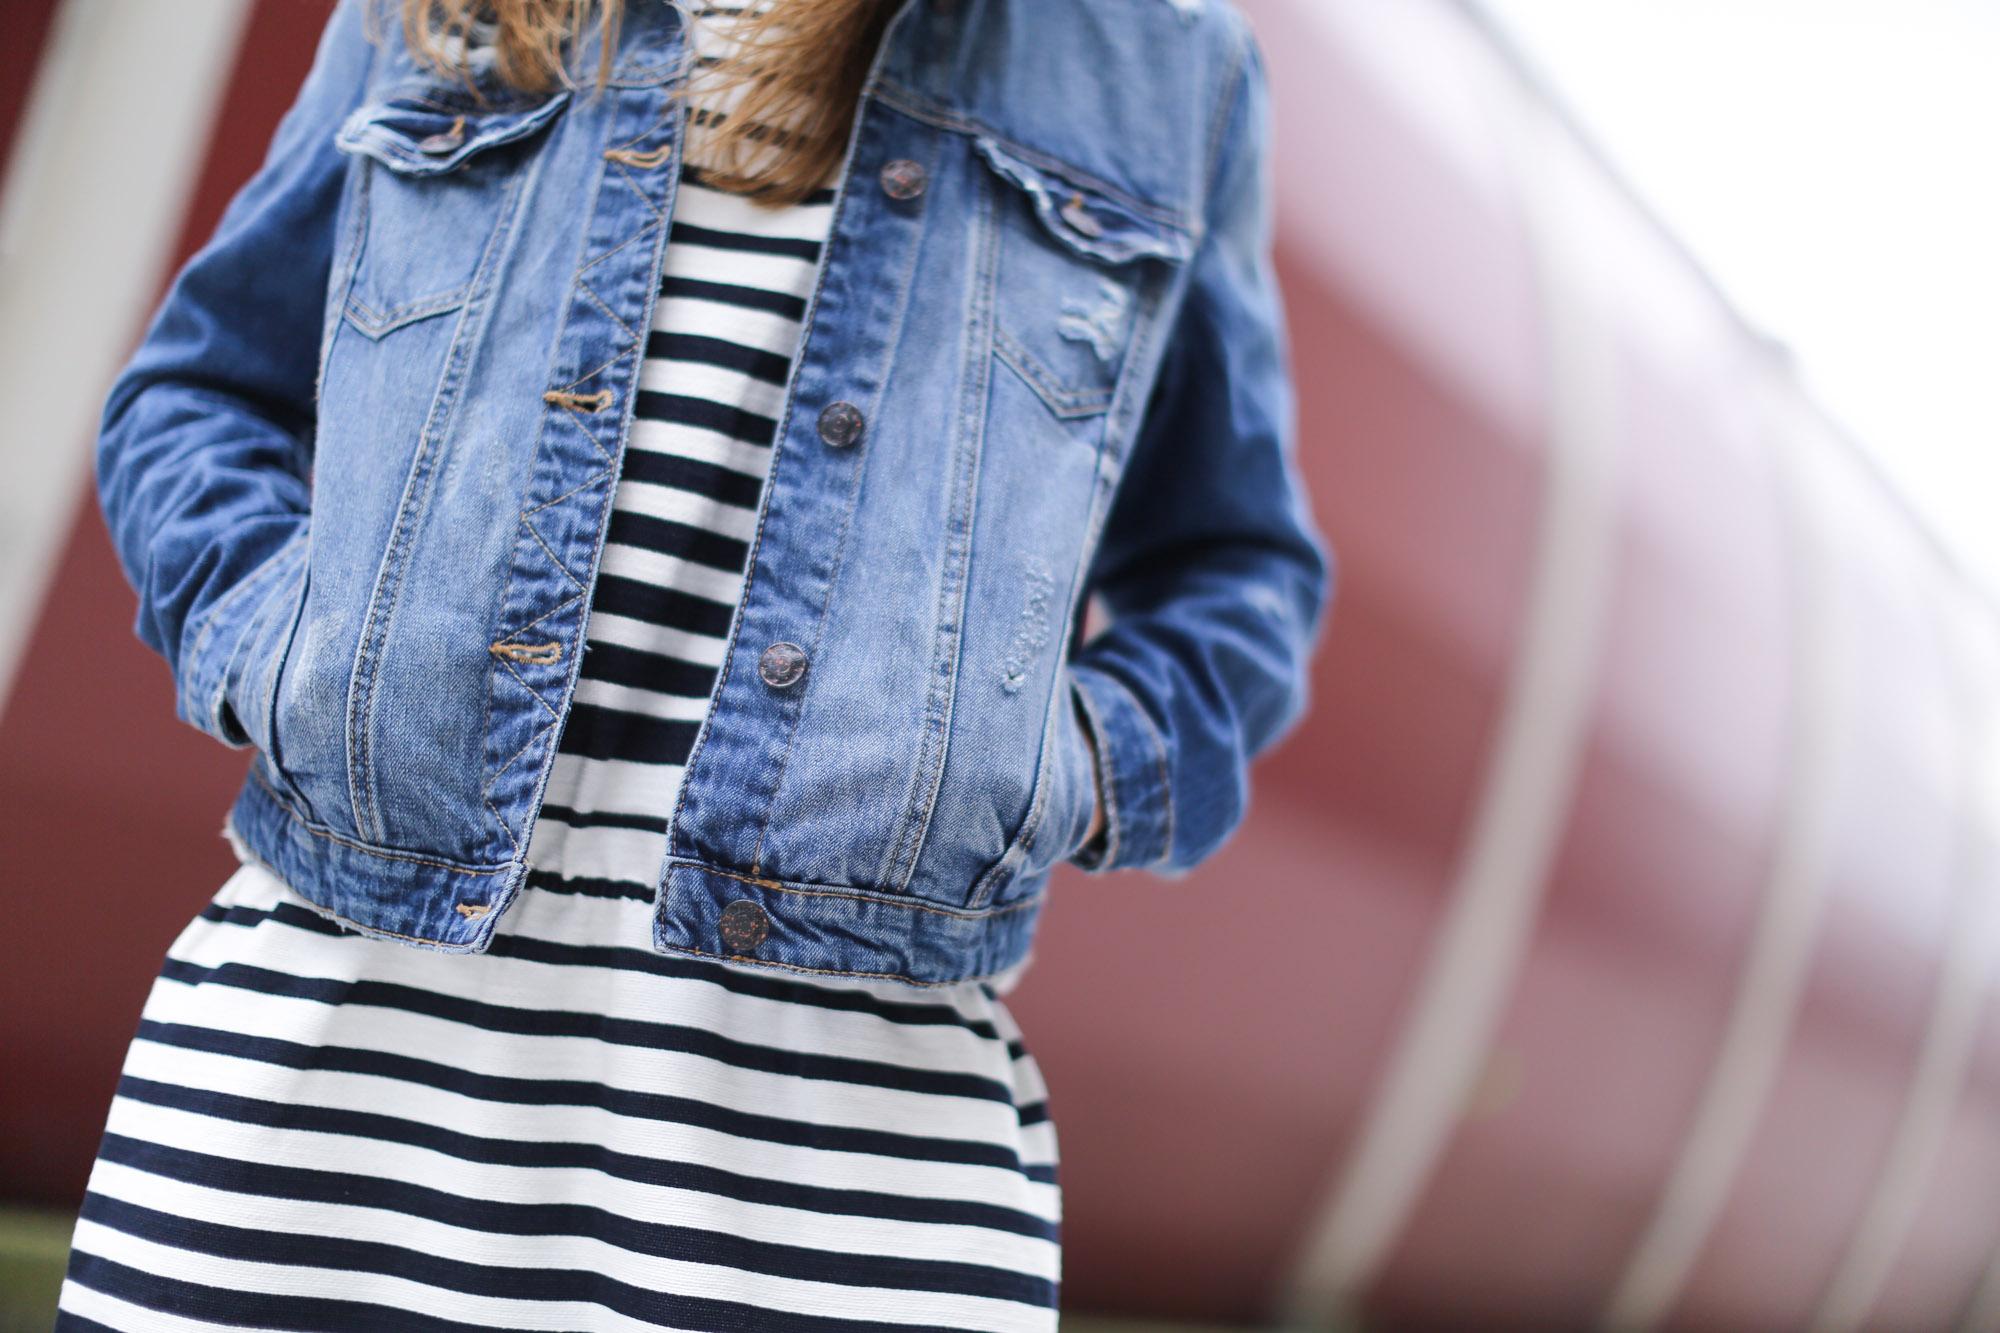 Clochet-streetstyle-suiteblanco-denim-jacket-stripped-dress-superga-classic-navy-2